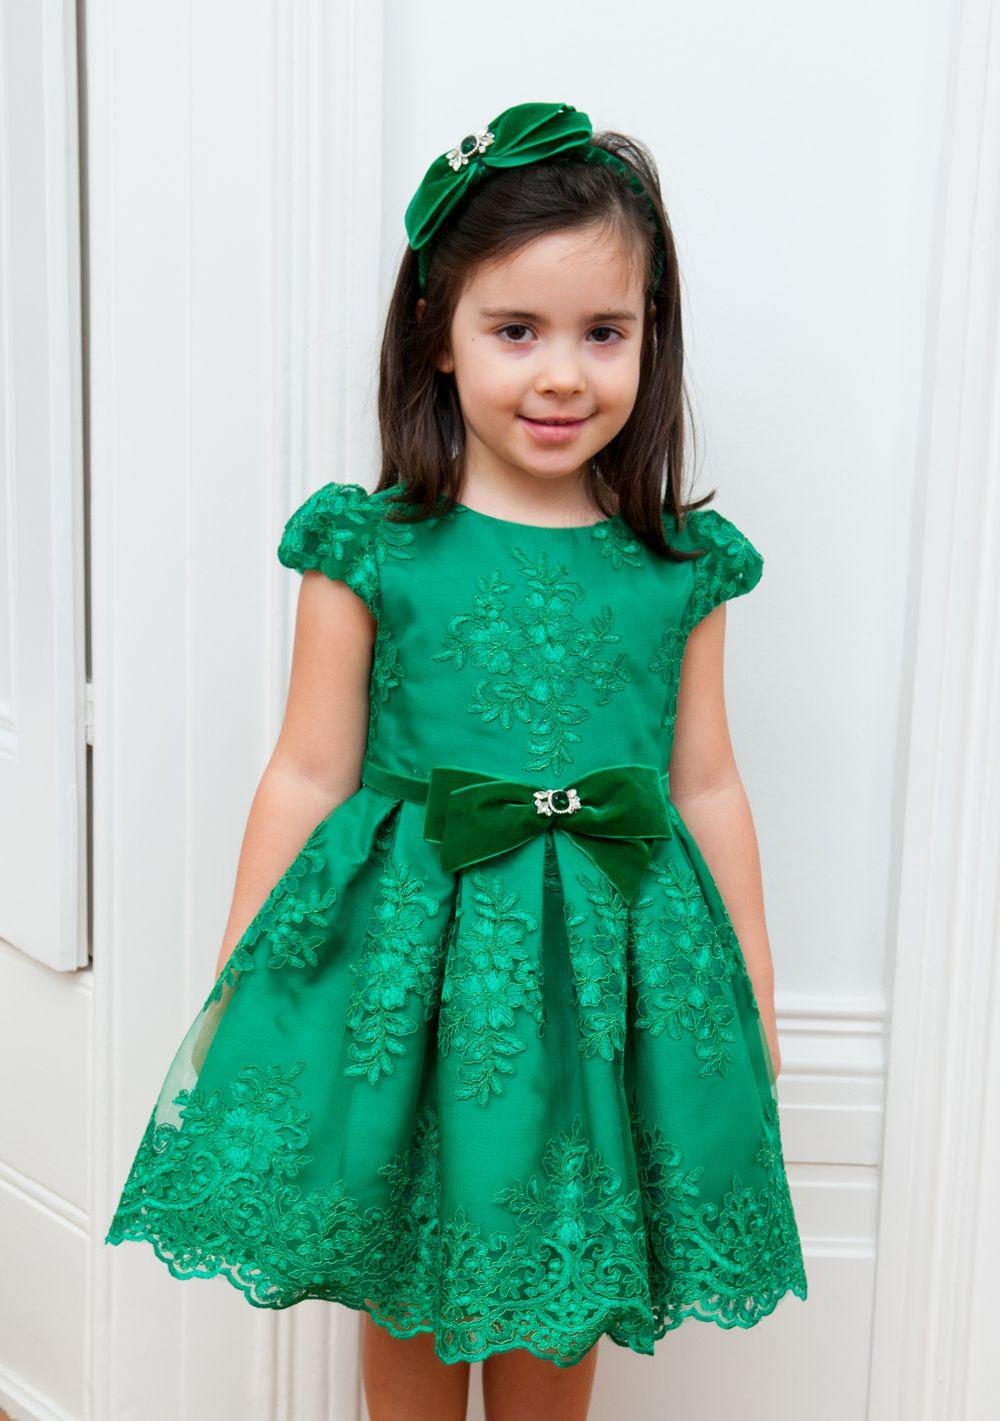 Park Art|My WordPress Blog_Green Party Dress For Baby Girl